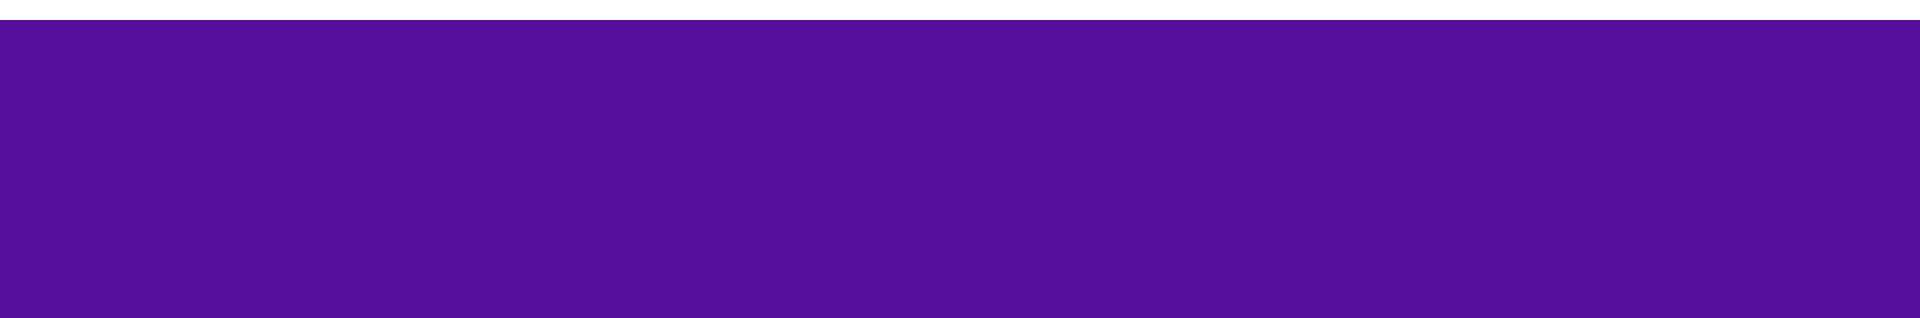 gradient_006_40.png